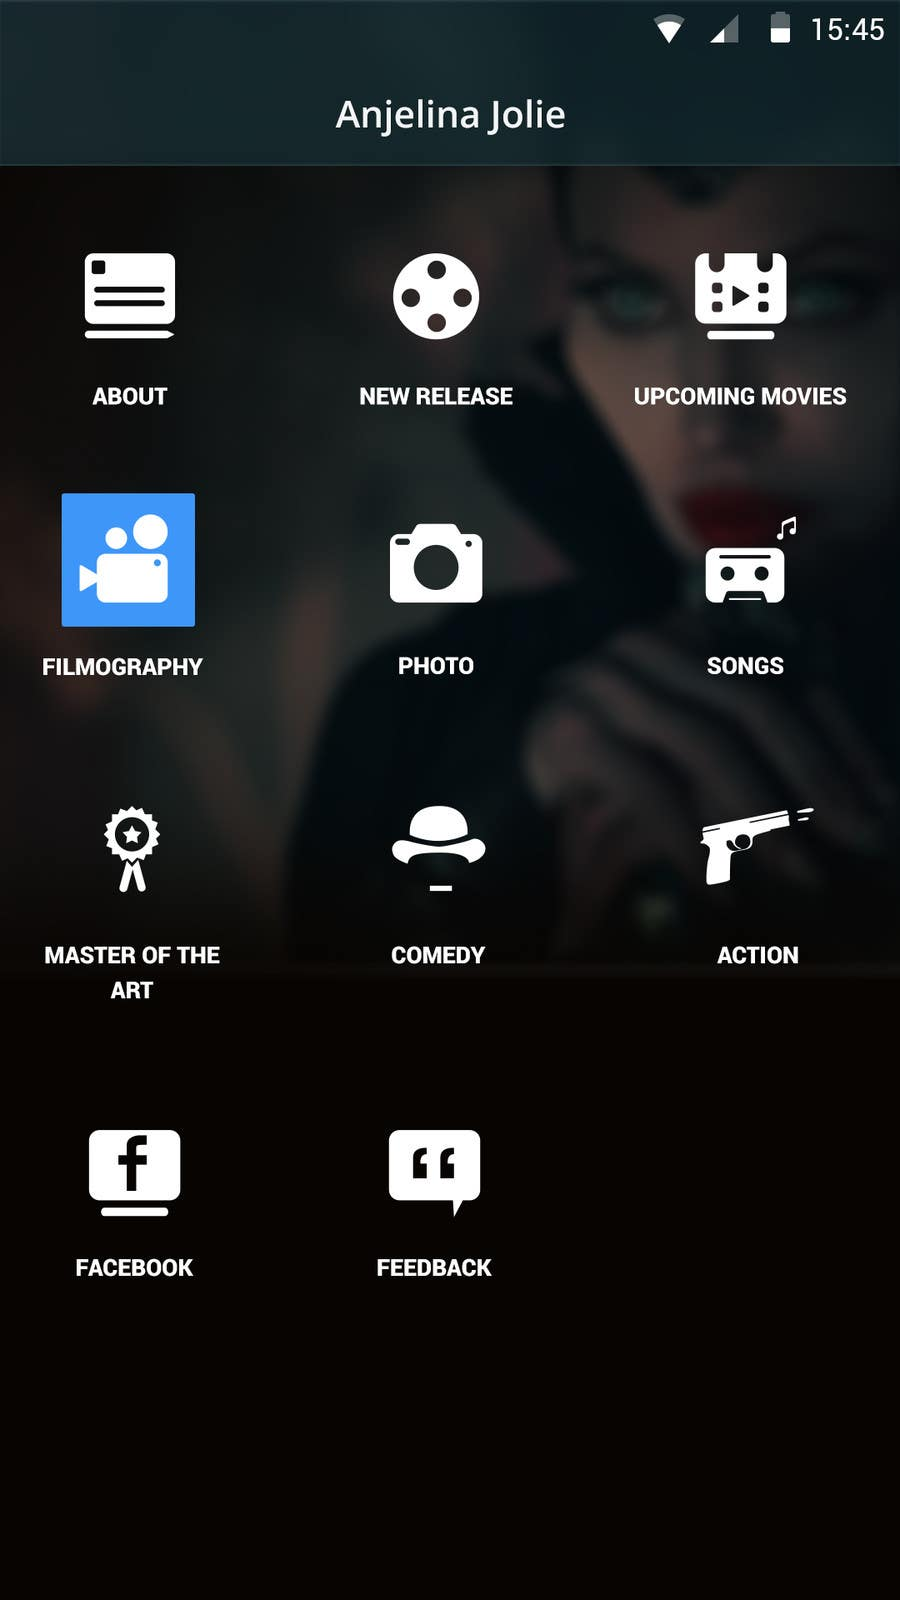 Konkurrenceindlæg #                                        14                                      for                                         Improve an App Home Screen Mockup